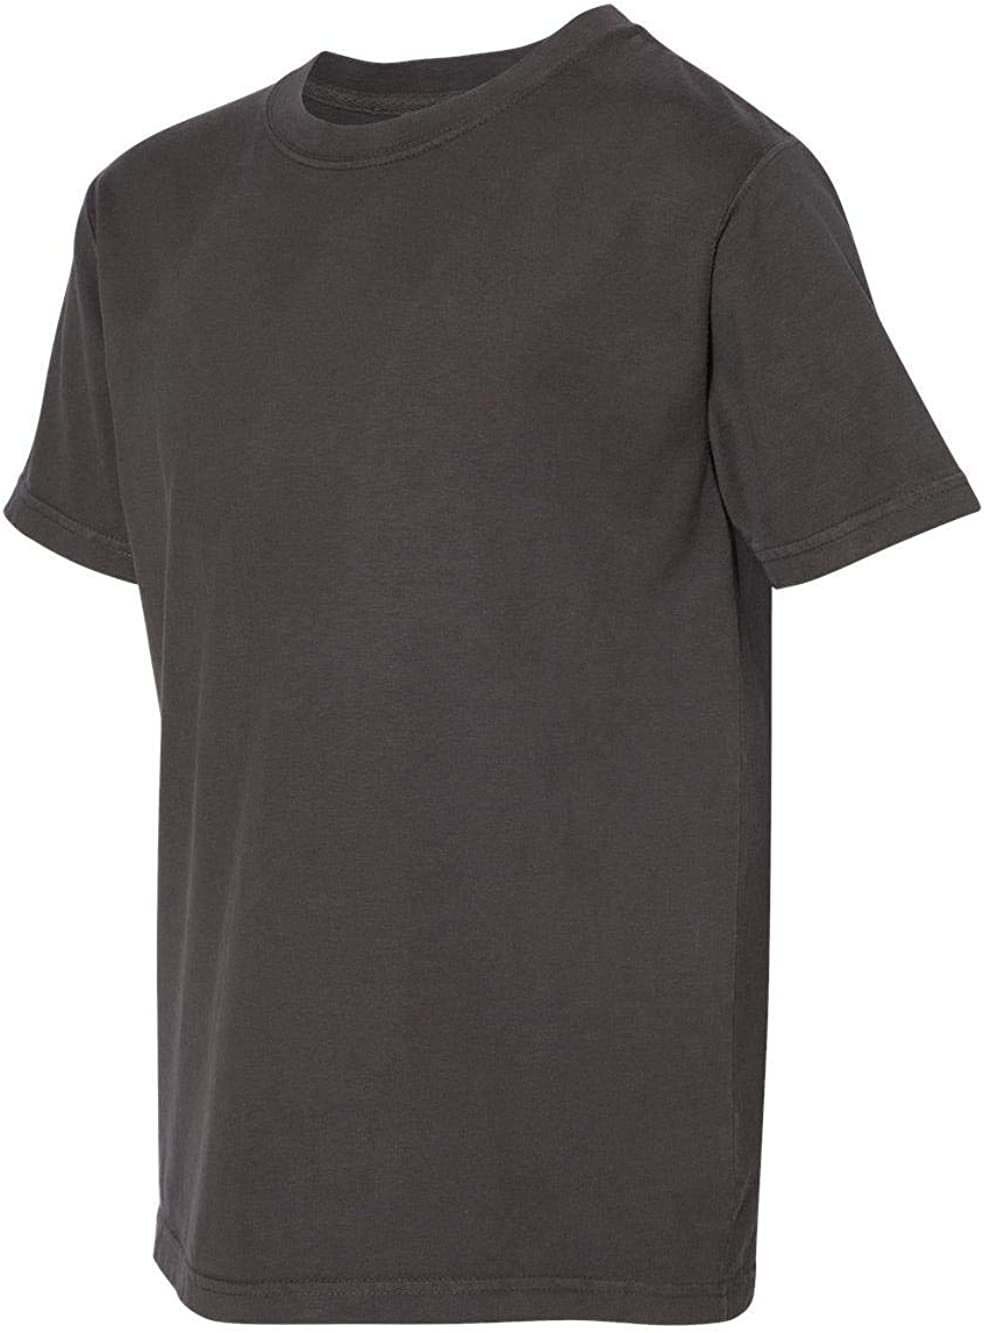 Hanes ComfortWash Garment Dyed Youth Short Sleeve T-Shirt - GDH175 - XL - New Railroad Grey